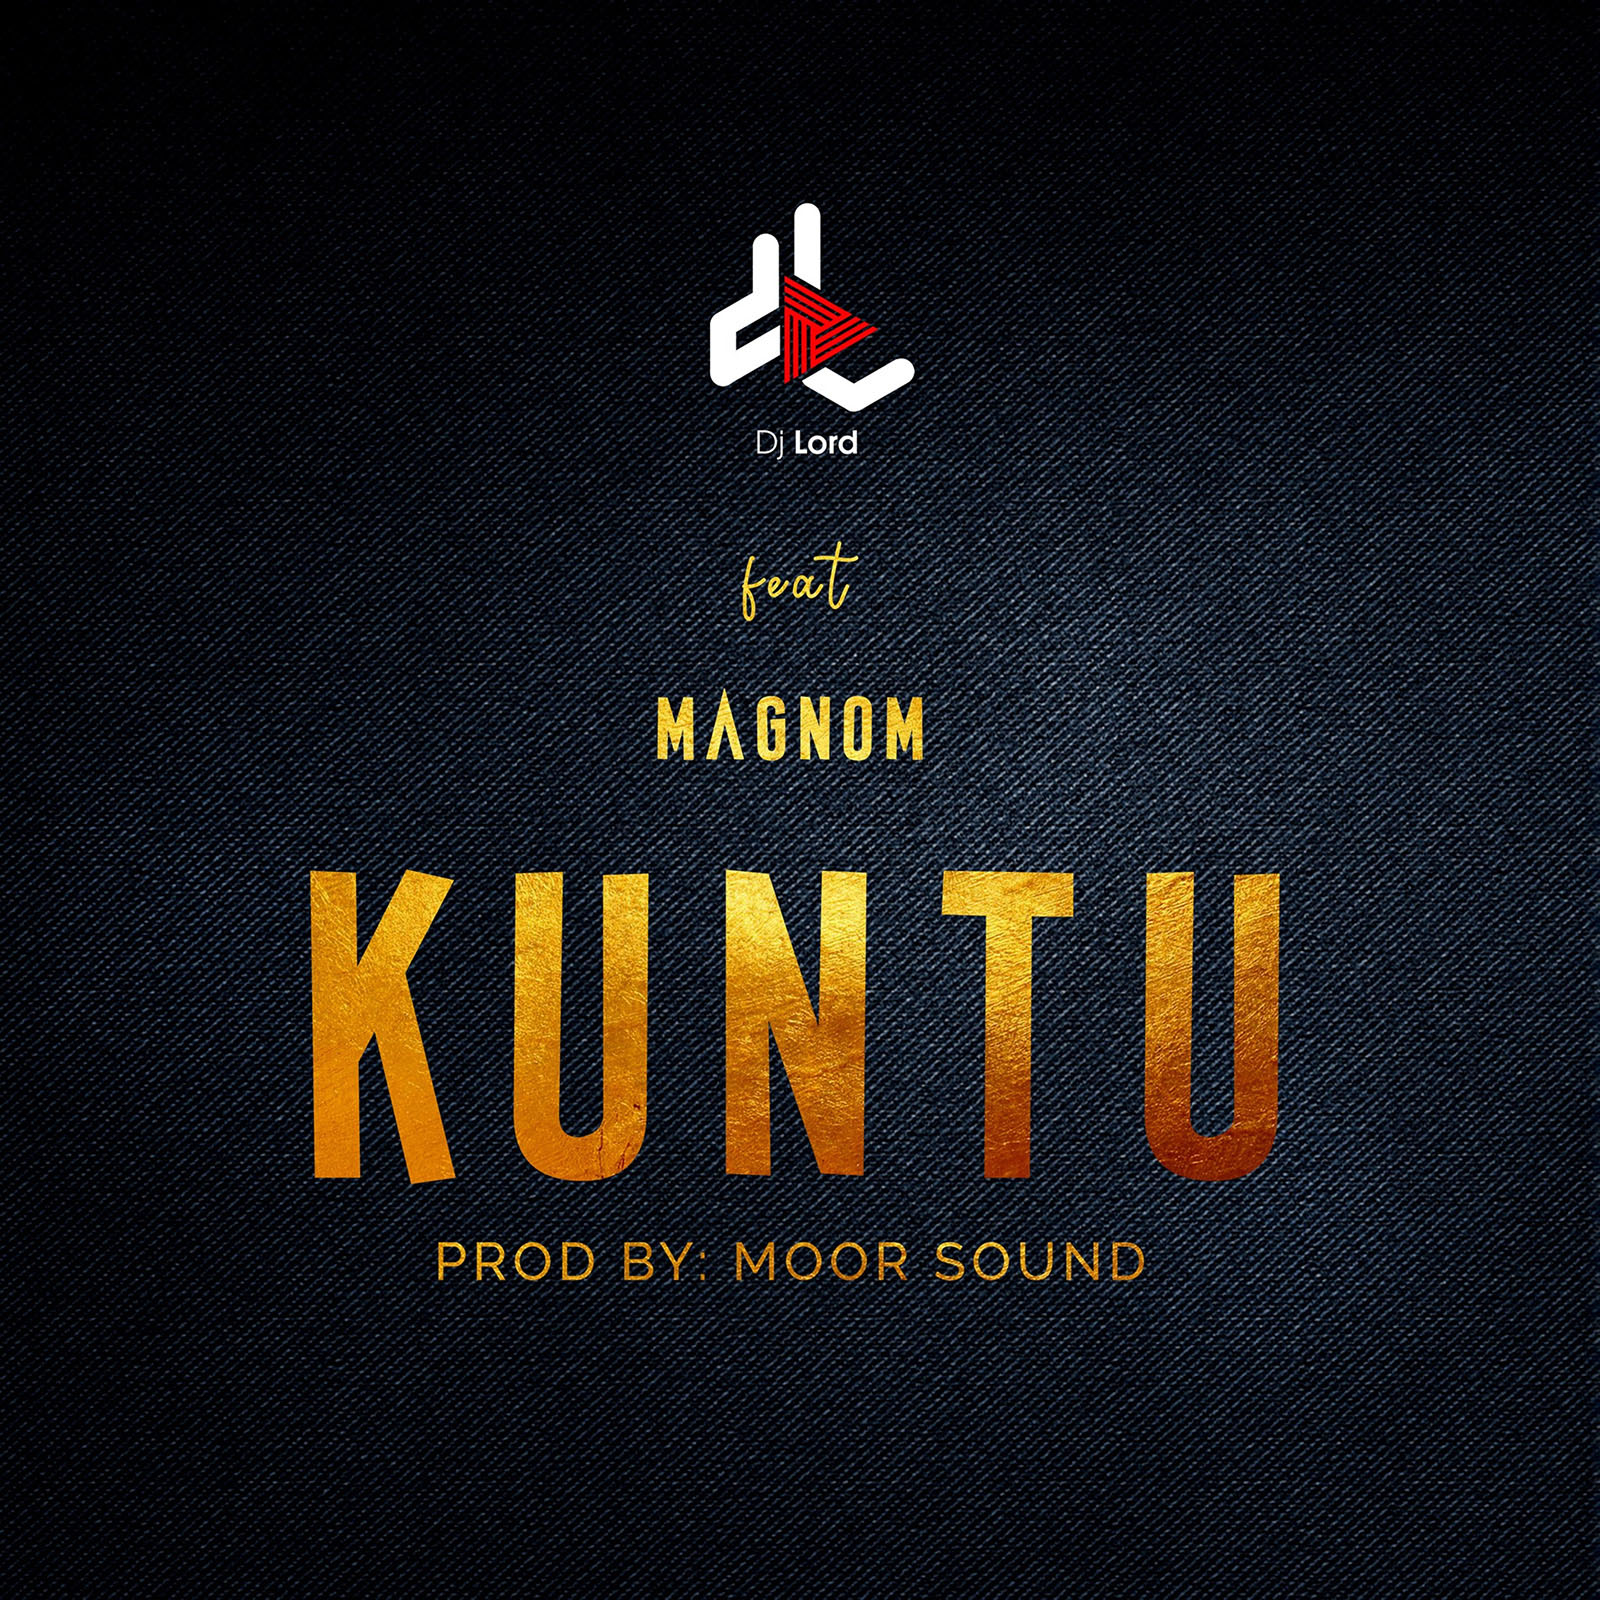 Kuntu by DJ Lord feat. Magnom